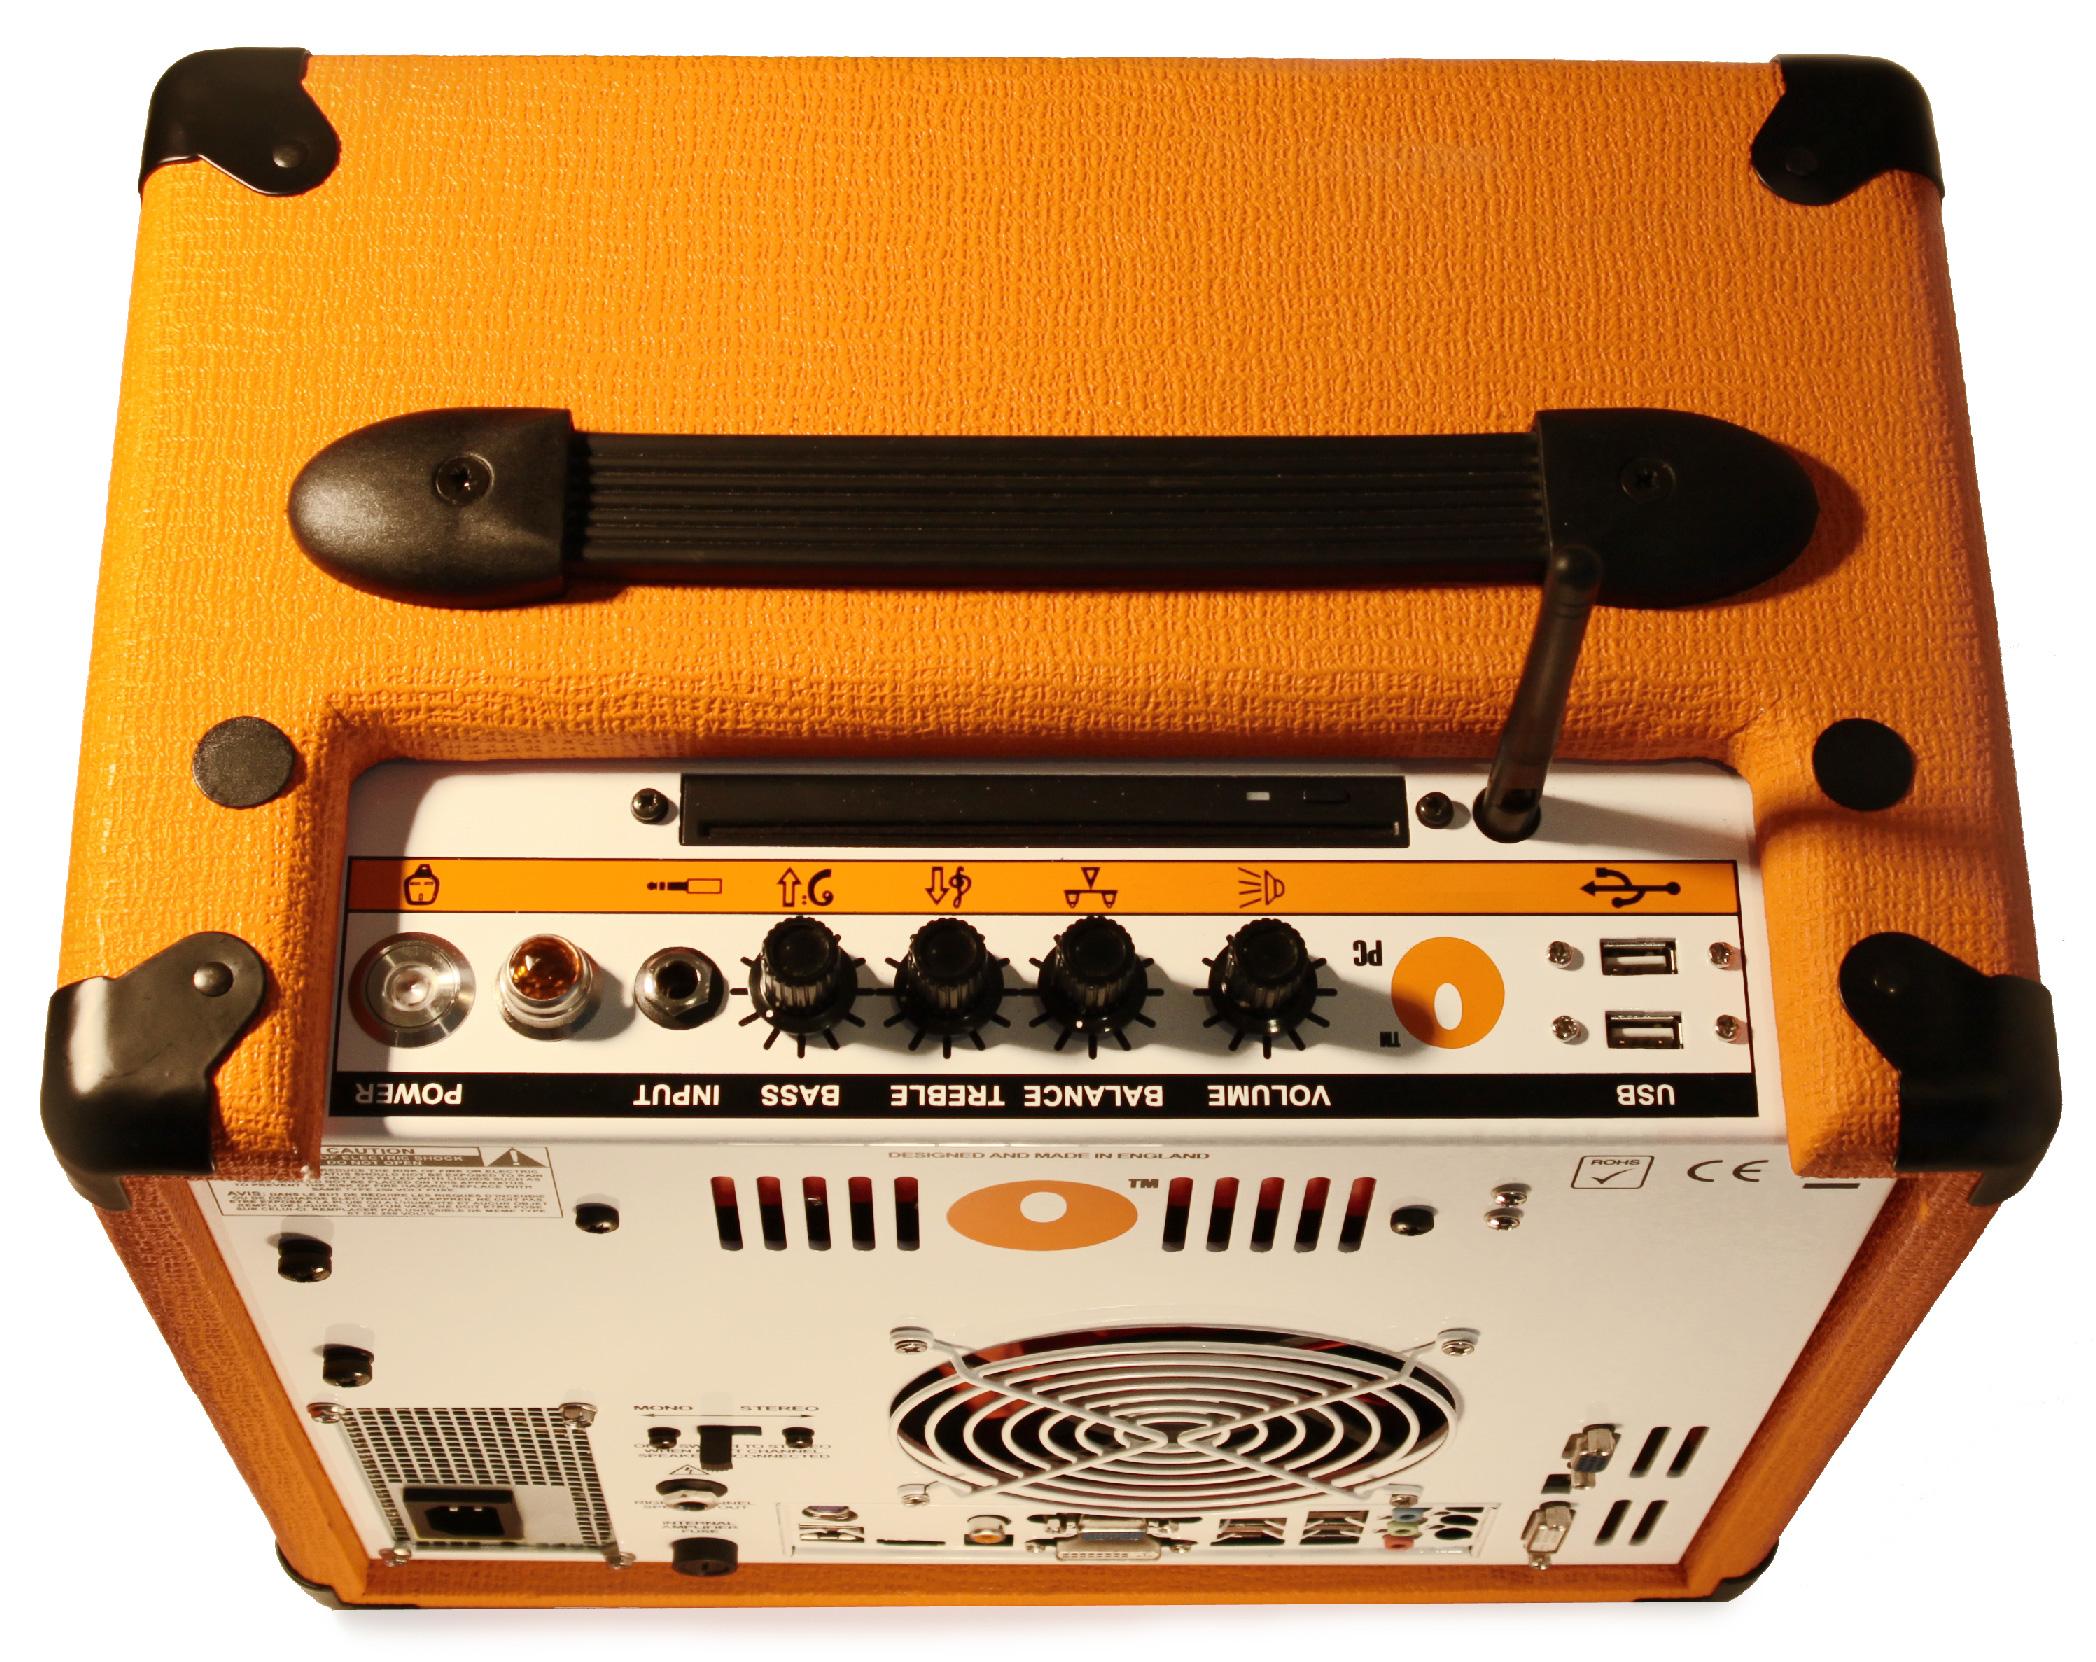 orange amps all in one computer amplifier speaker the opc gearslutz pro audio community. Black Bedroom Furniture Sets. Home Design Ideas